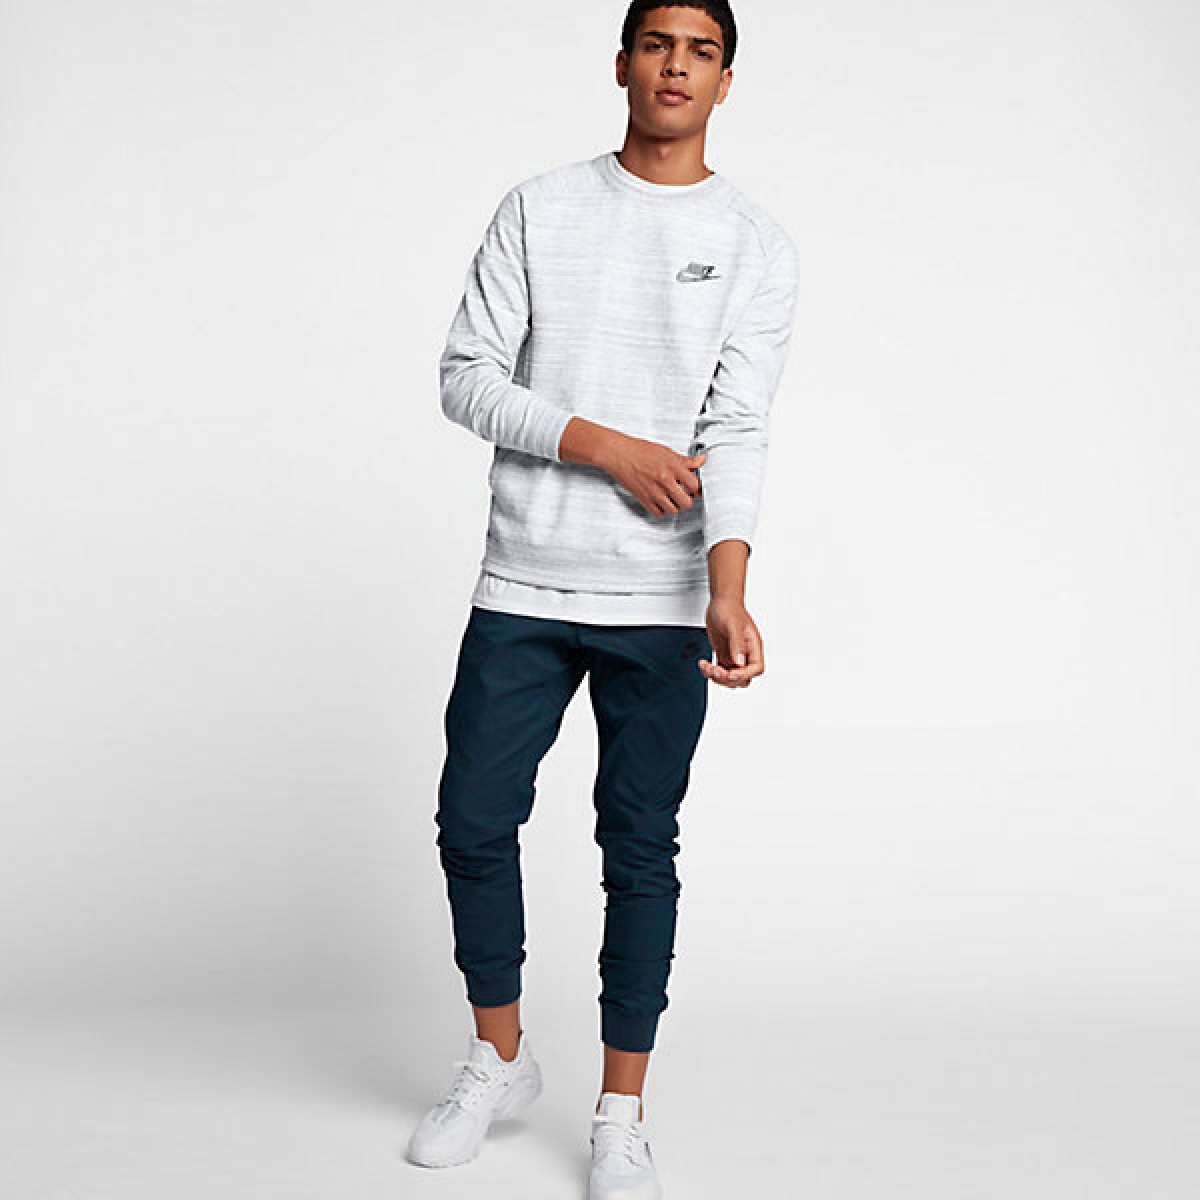 Nike Sportswear Advance 15 Crew 'Grey' 861758-100